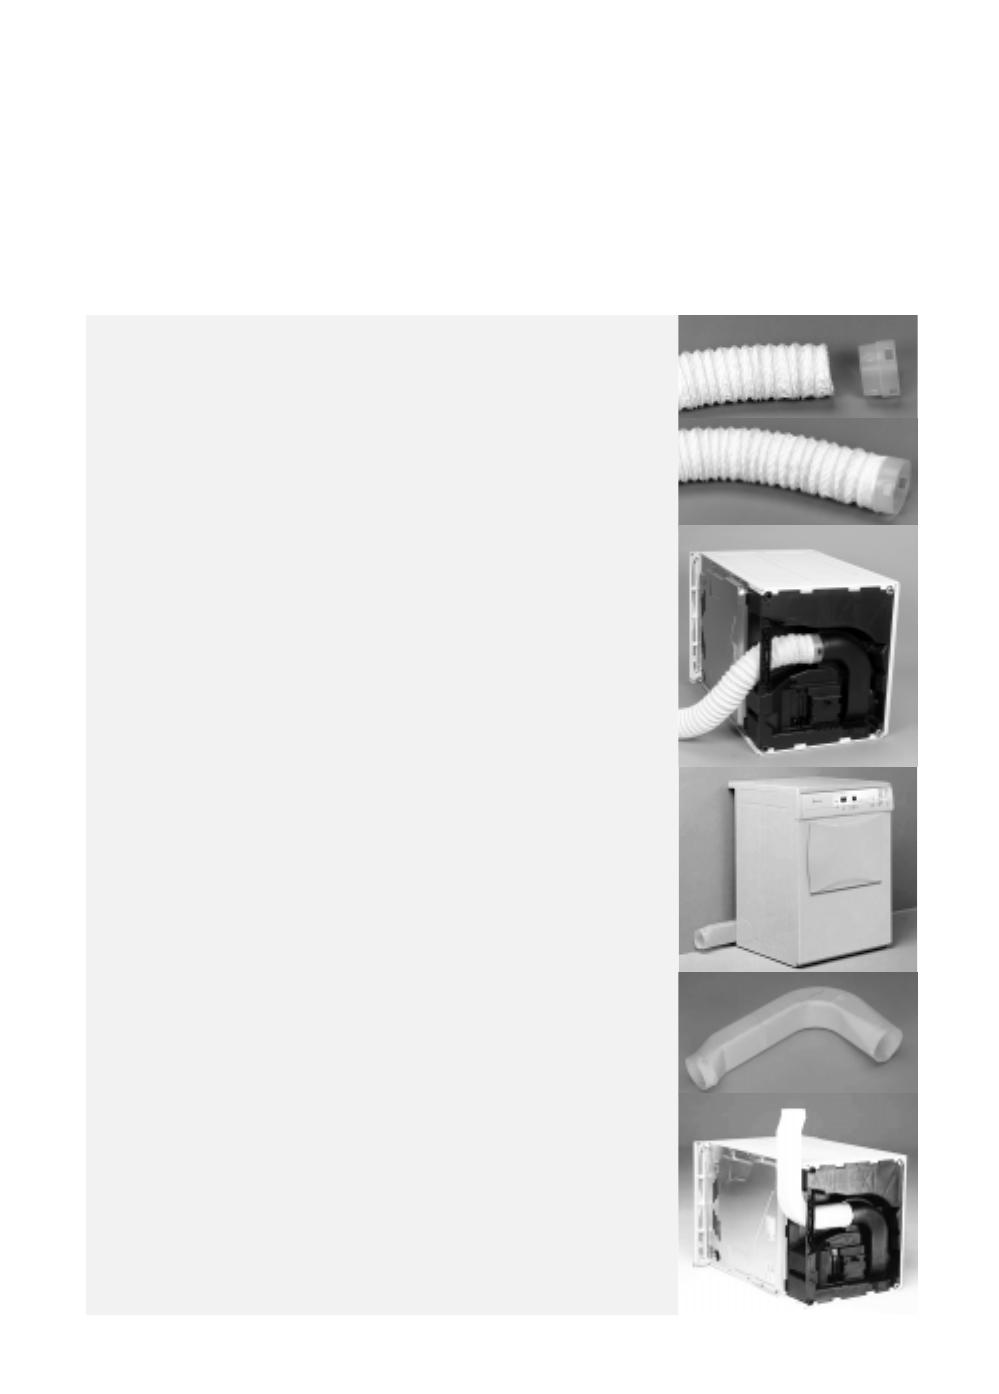 handleiding bauknecht trak 1 stuttgart pagina 5 van 7 deutsch. Black Bedroom Furniture Sets. Home Design Ideas